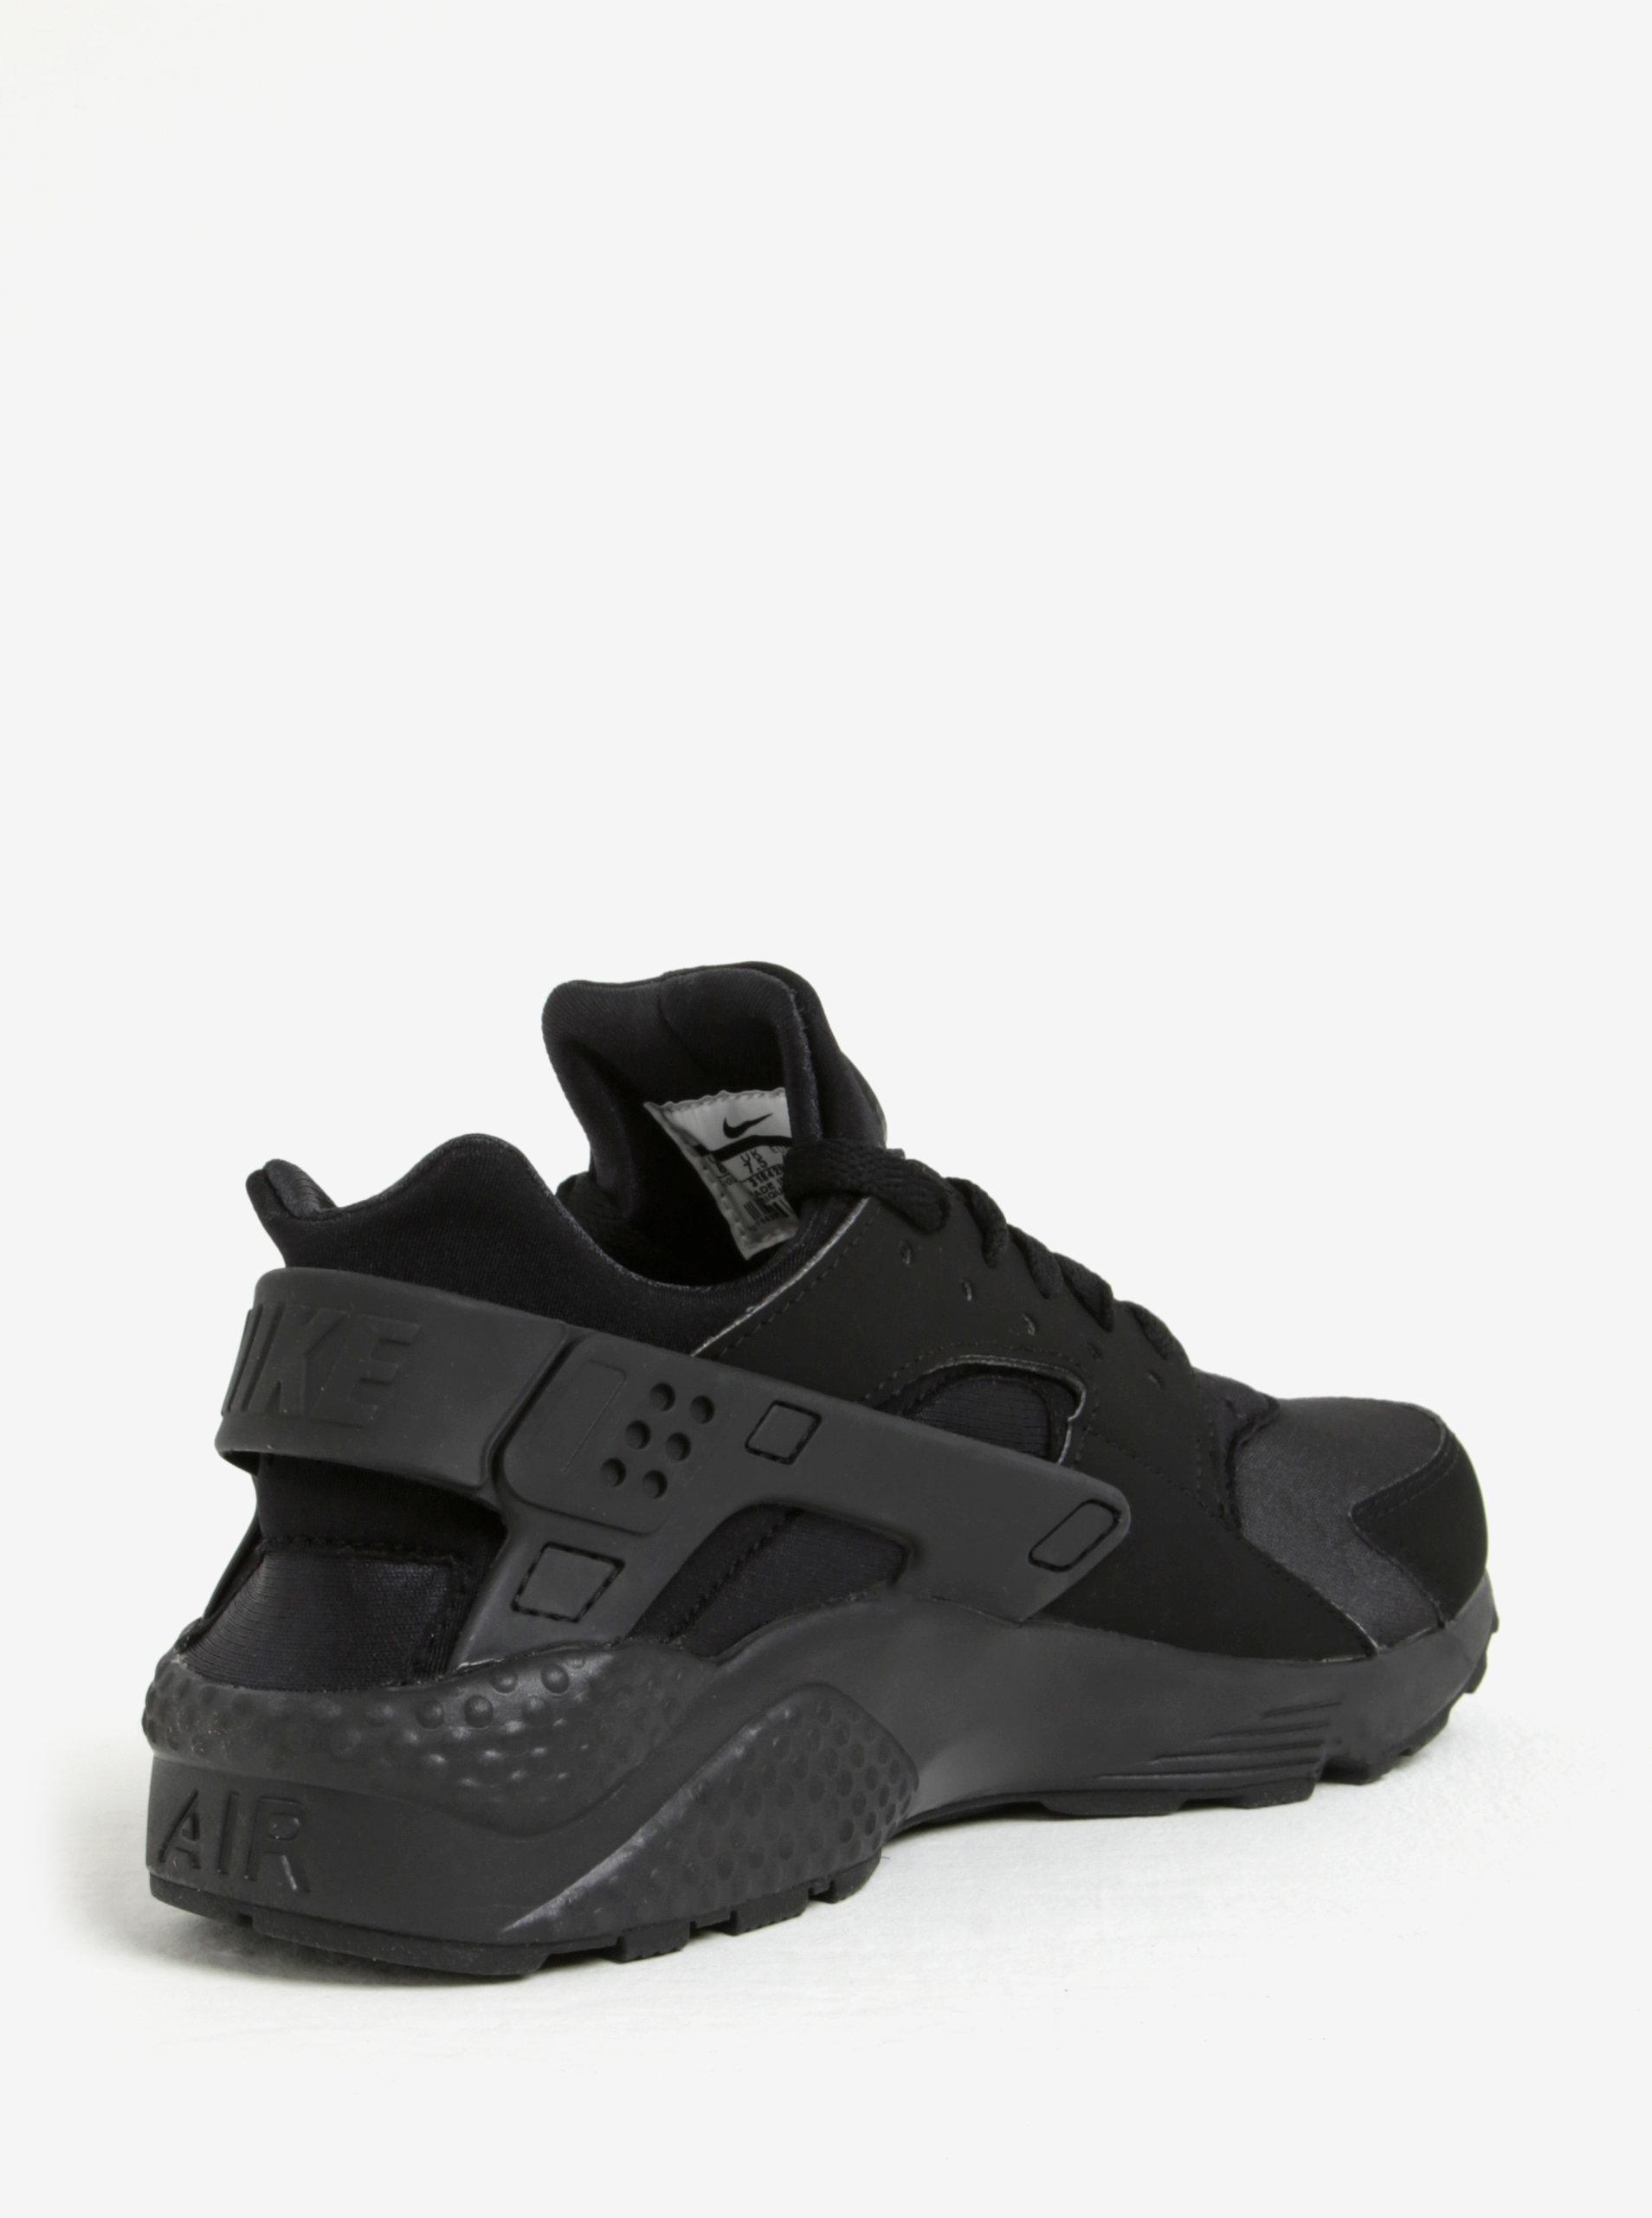 a8a7f20016e22 Čierne pánske tenisky Nike Air Huarache | ZOOT.sk